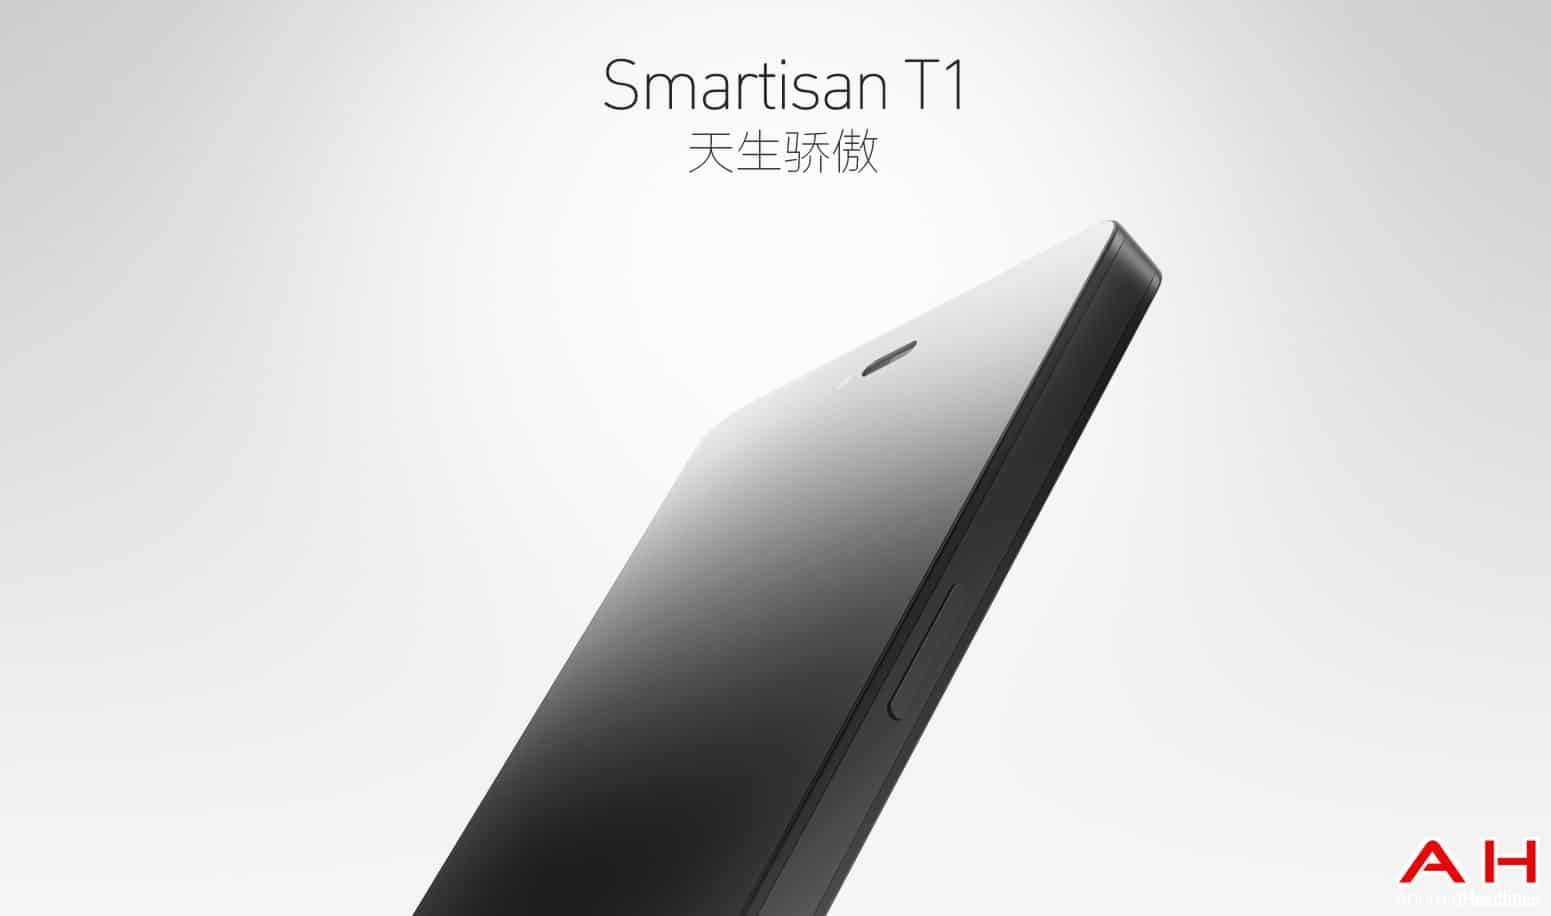 AH Smartisan T1 1.0